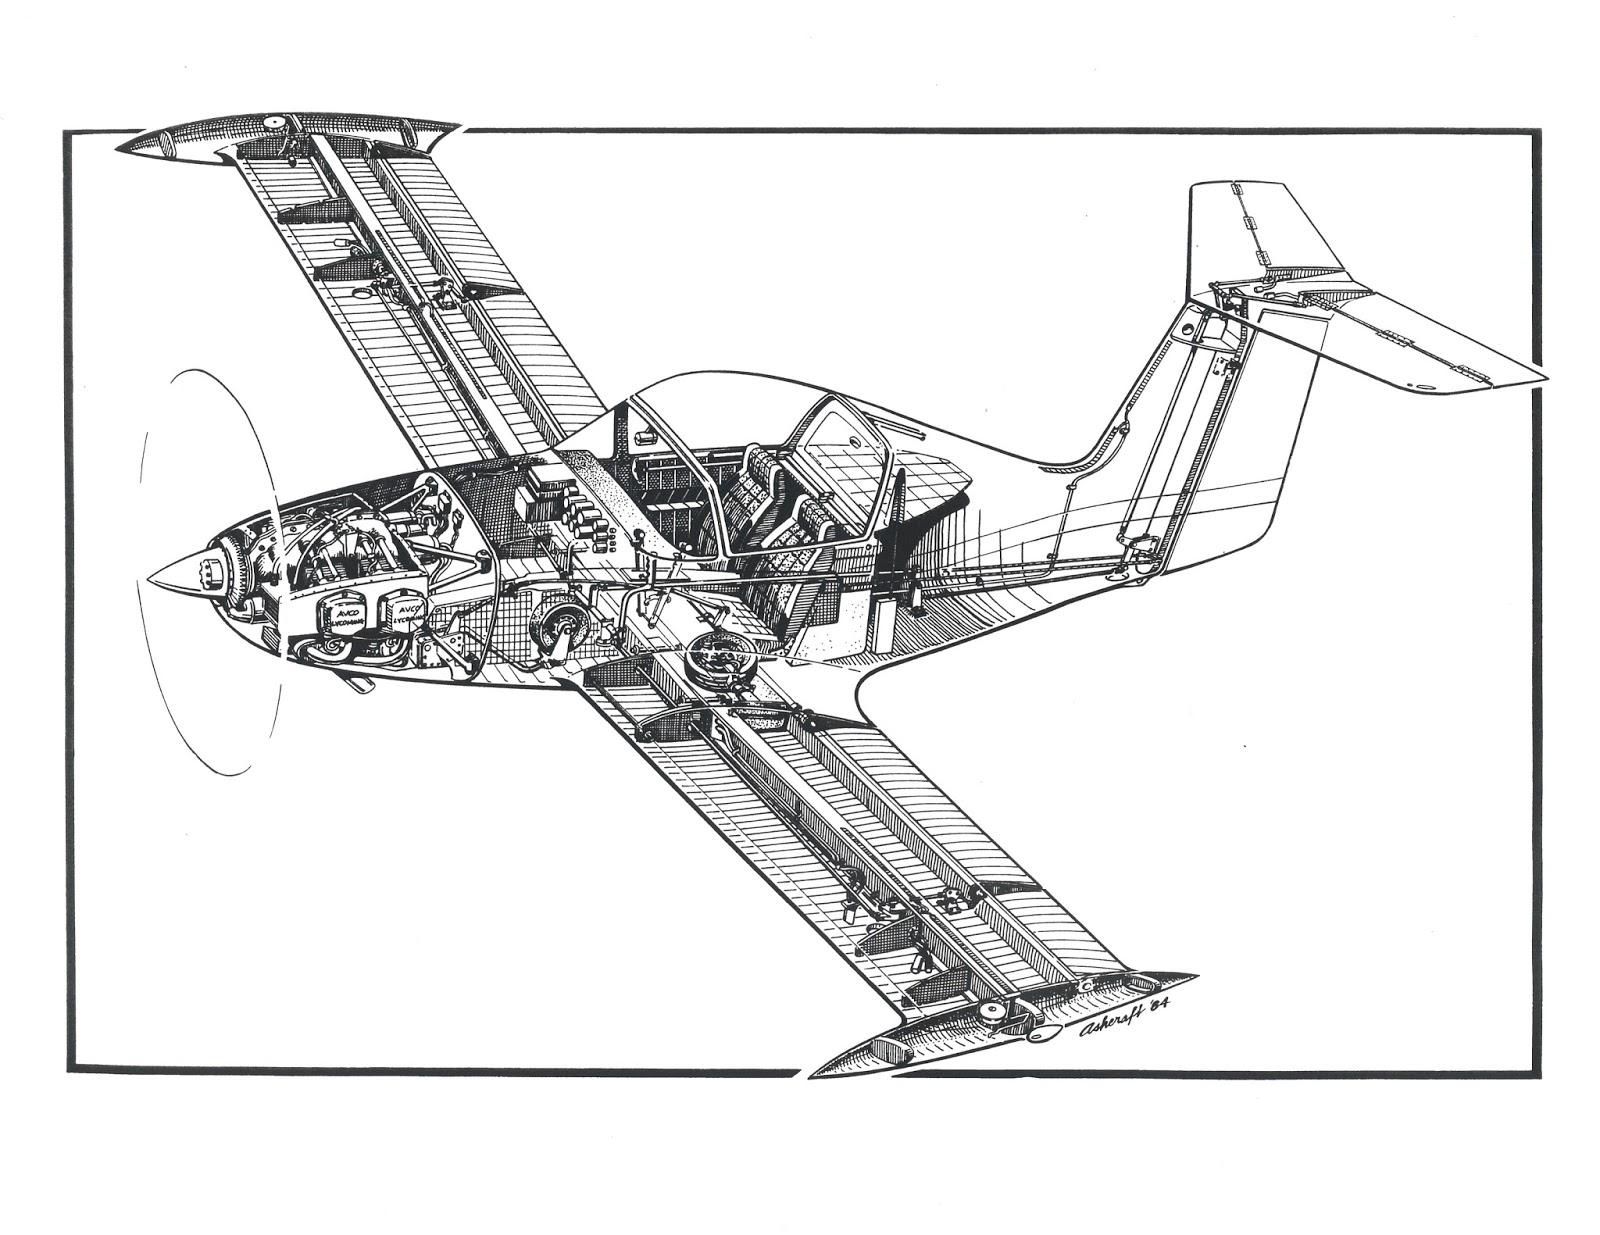 SAAB JOURNAL: JACK ASHCRAFT'S ARTWORK--PHANTOM DRAWINGS